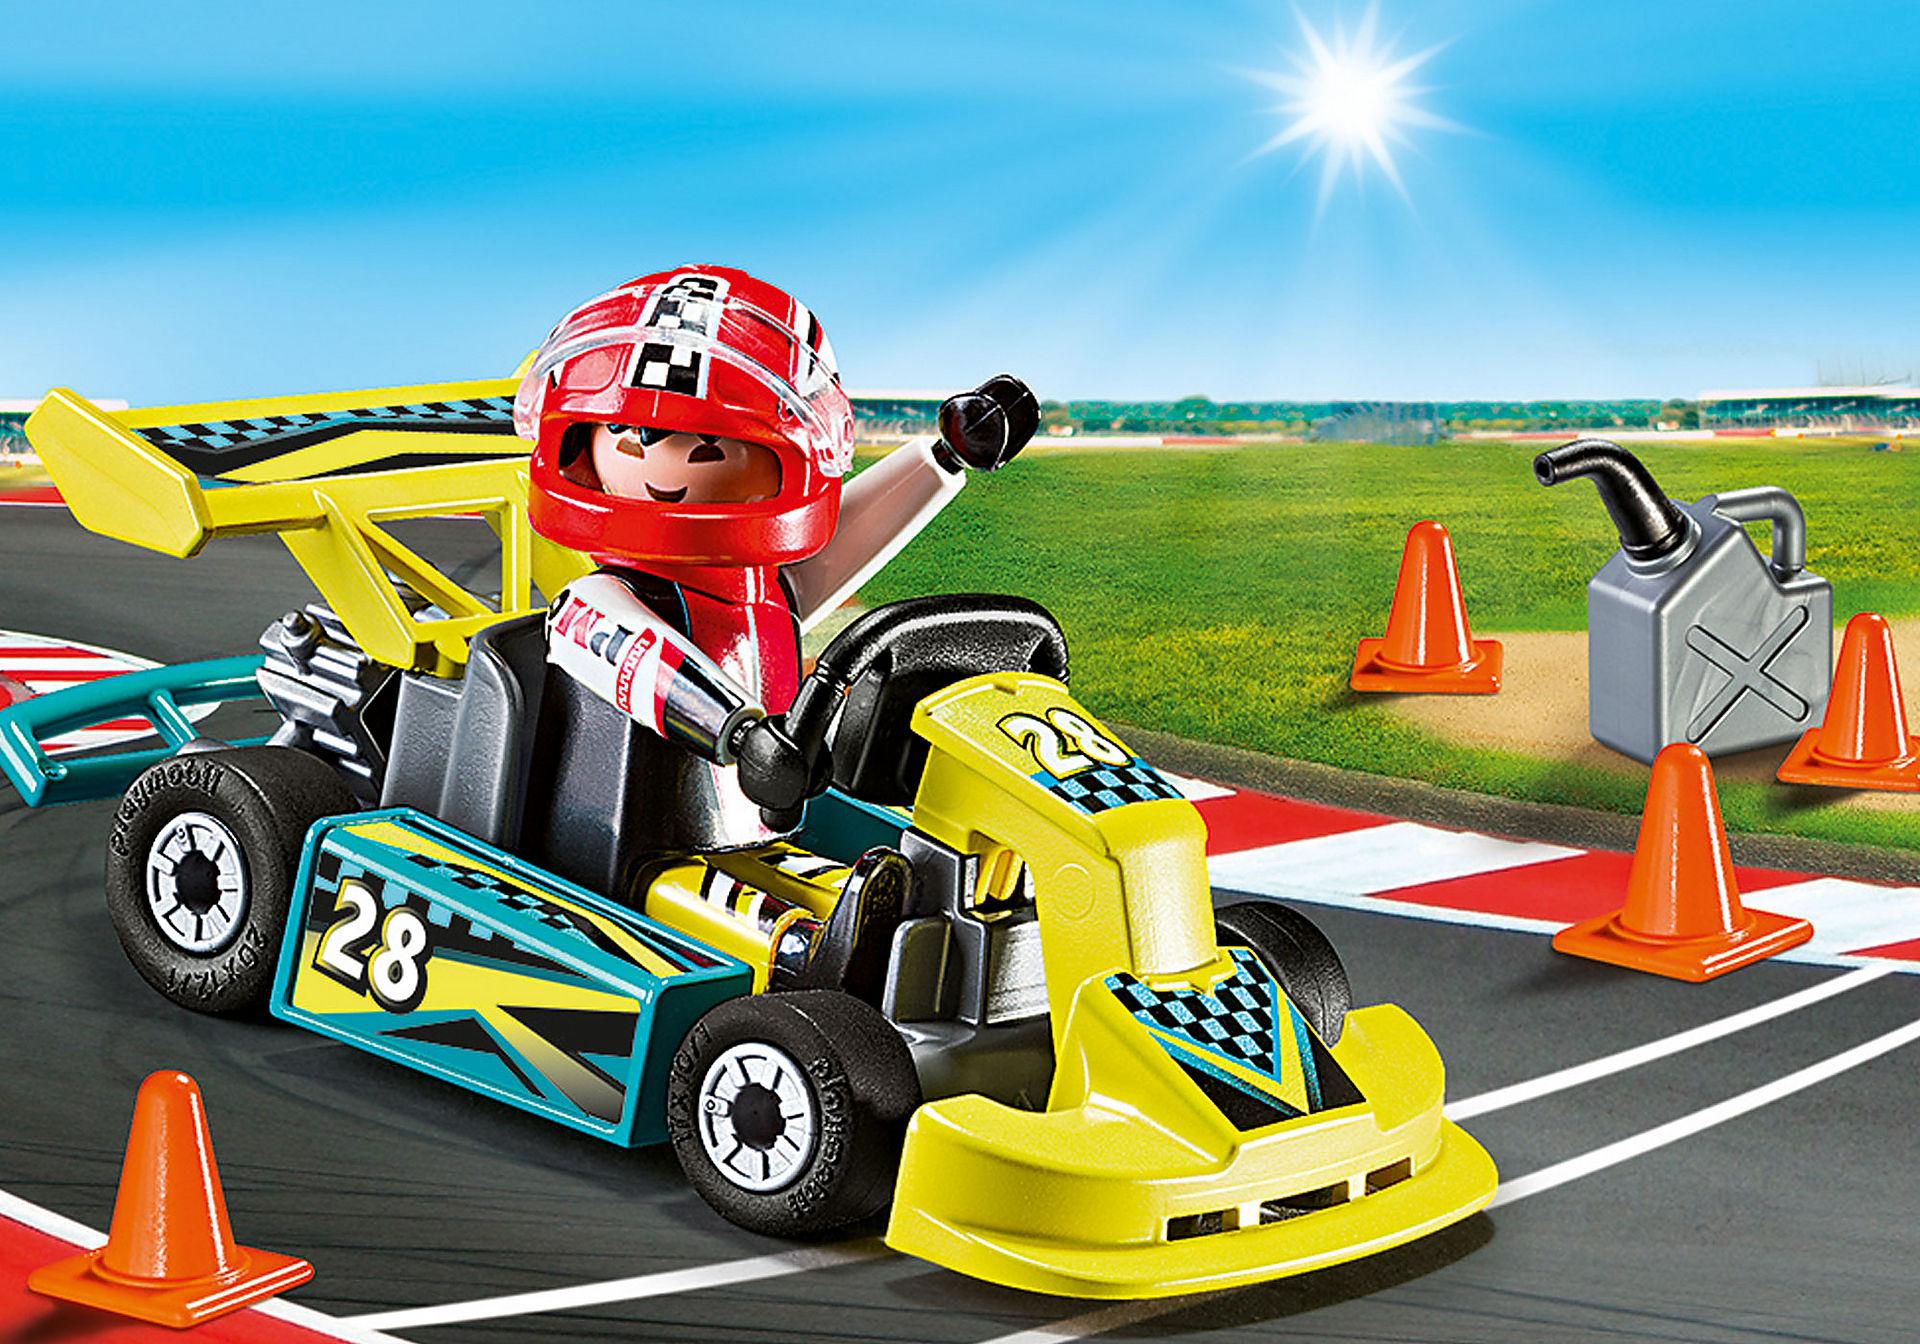 9322 Go-Kart Racer Carry Case zoom image1